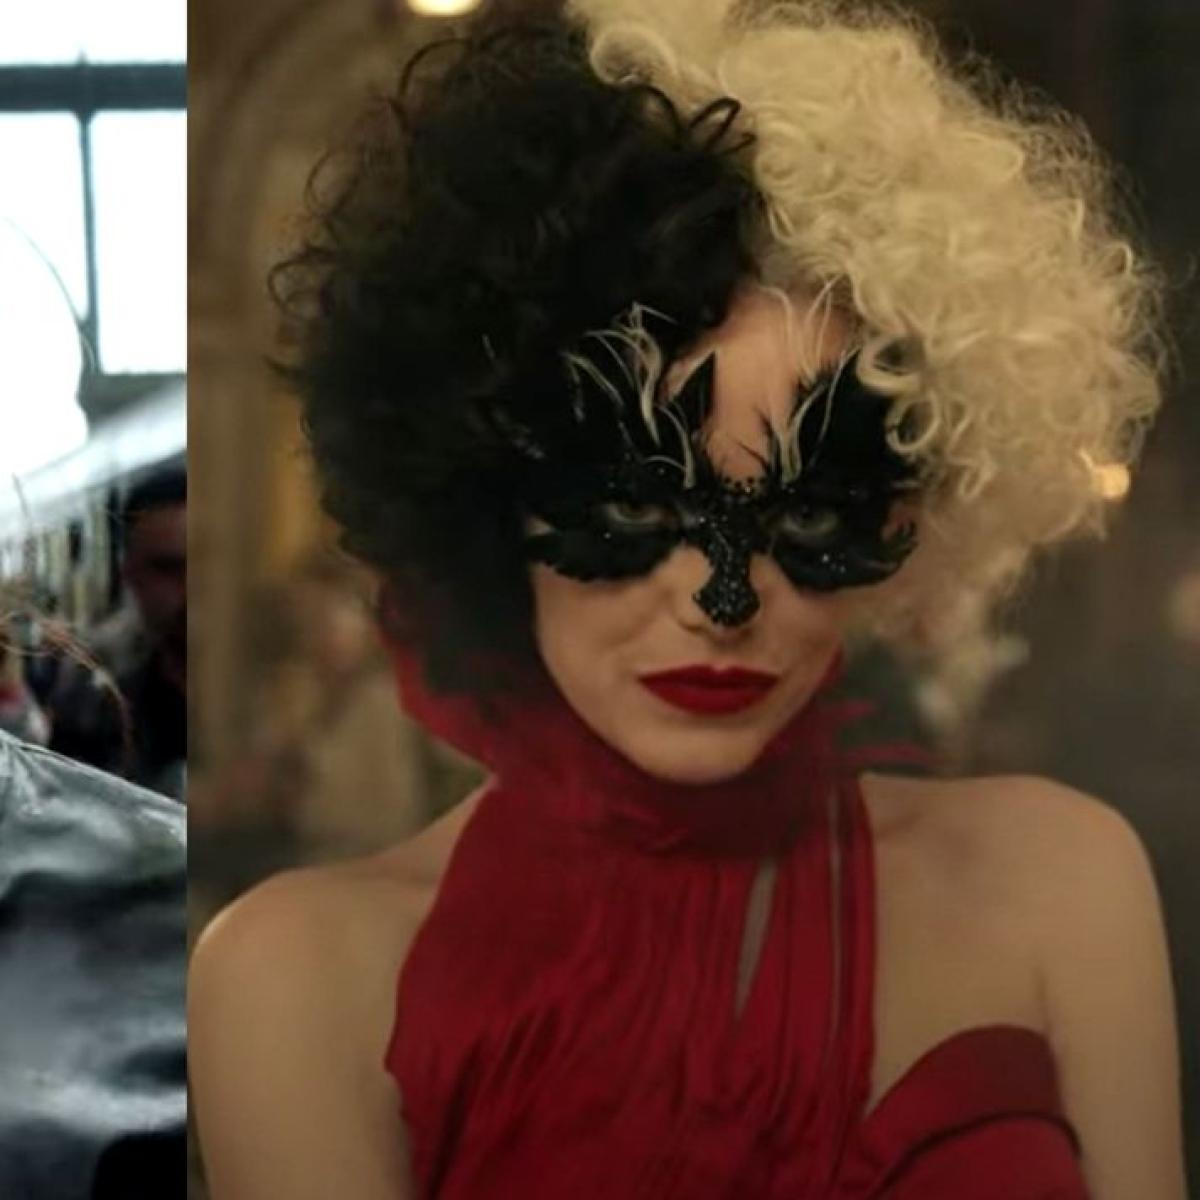 'Black Widow', 'Cruella' to release in theatres, stream on Disney Plus on same day